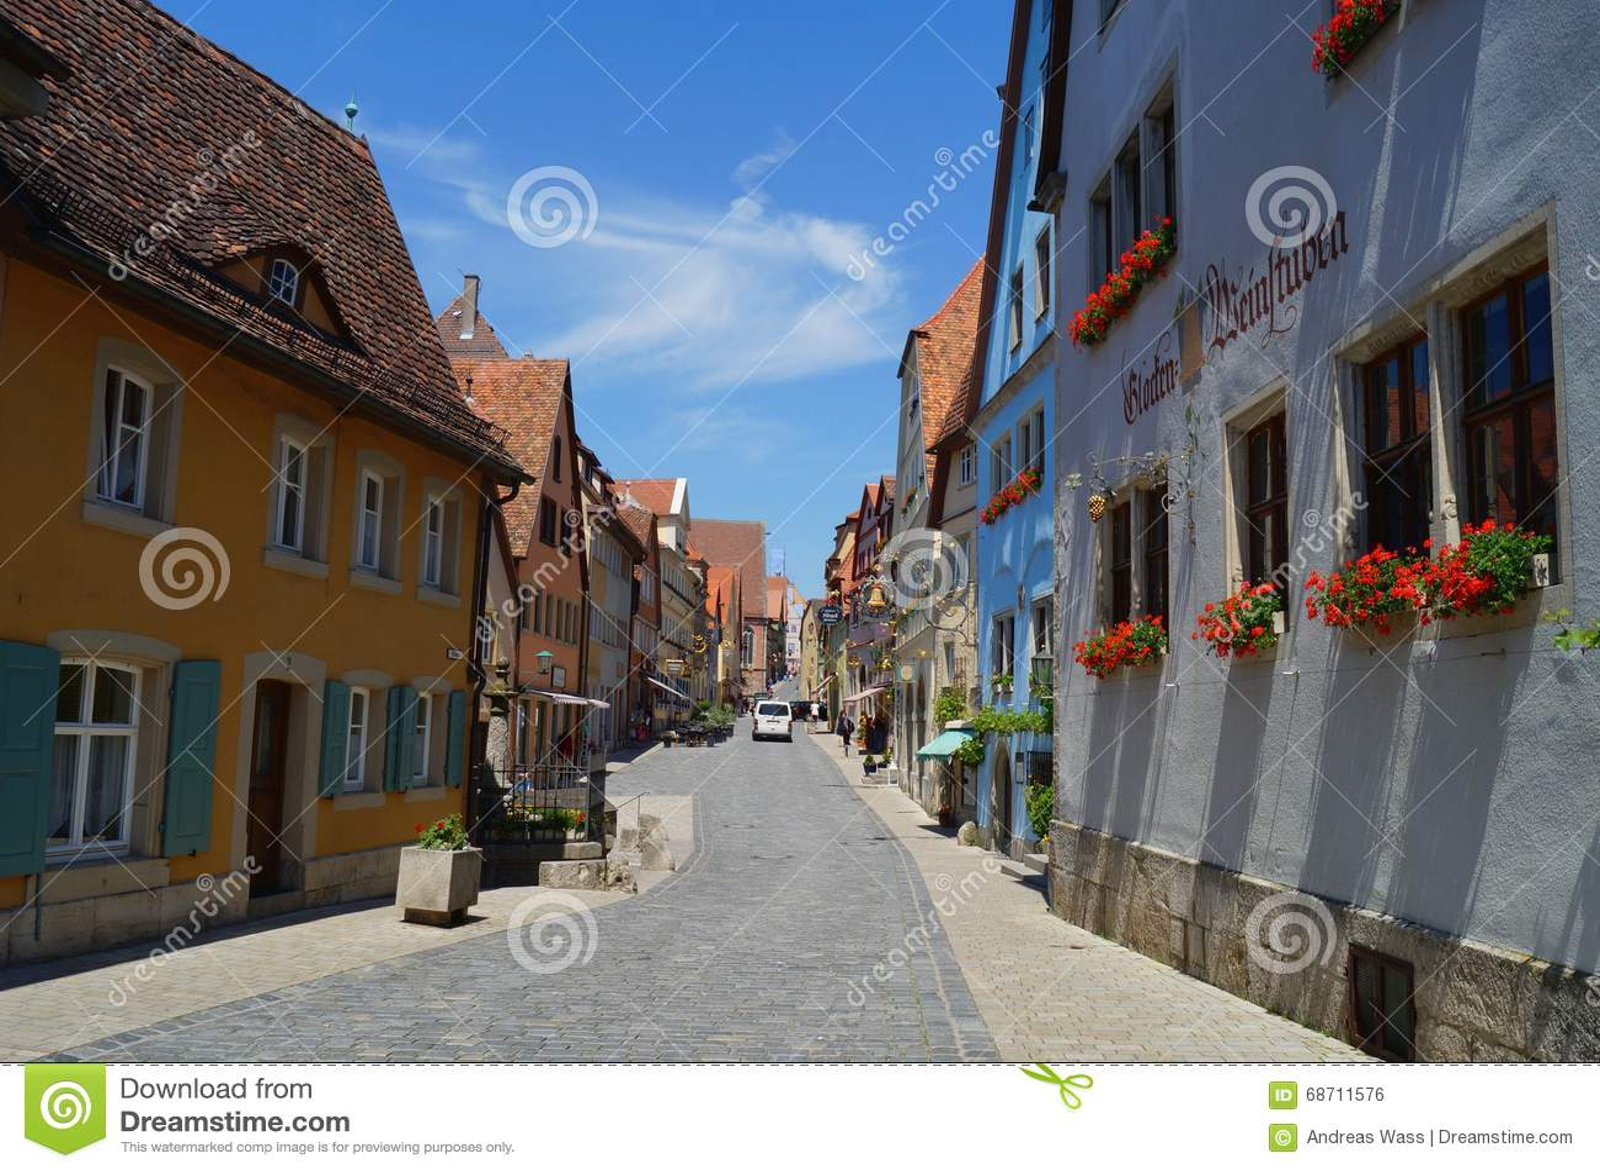 Historic town shopping street in Rothenburg ob der Tauber